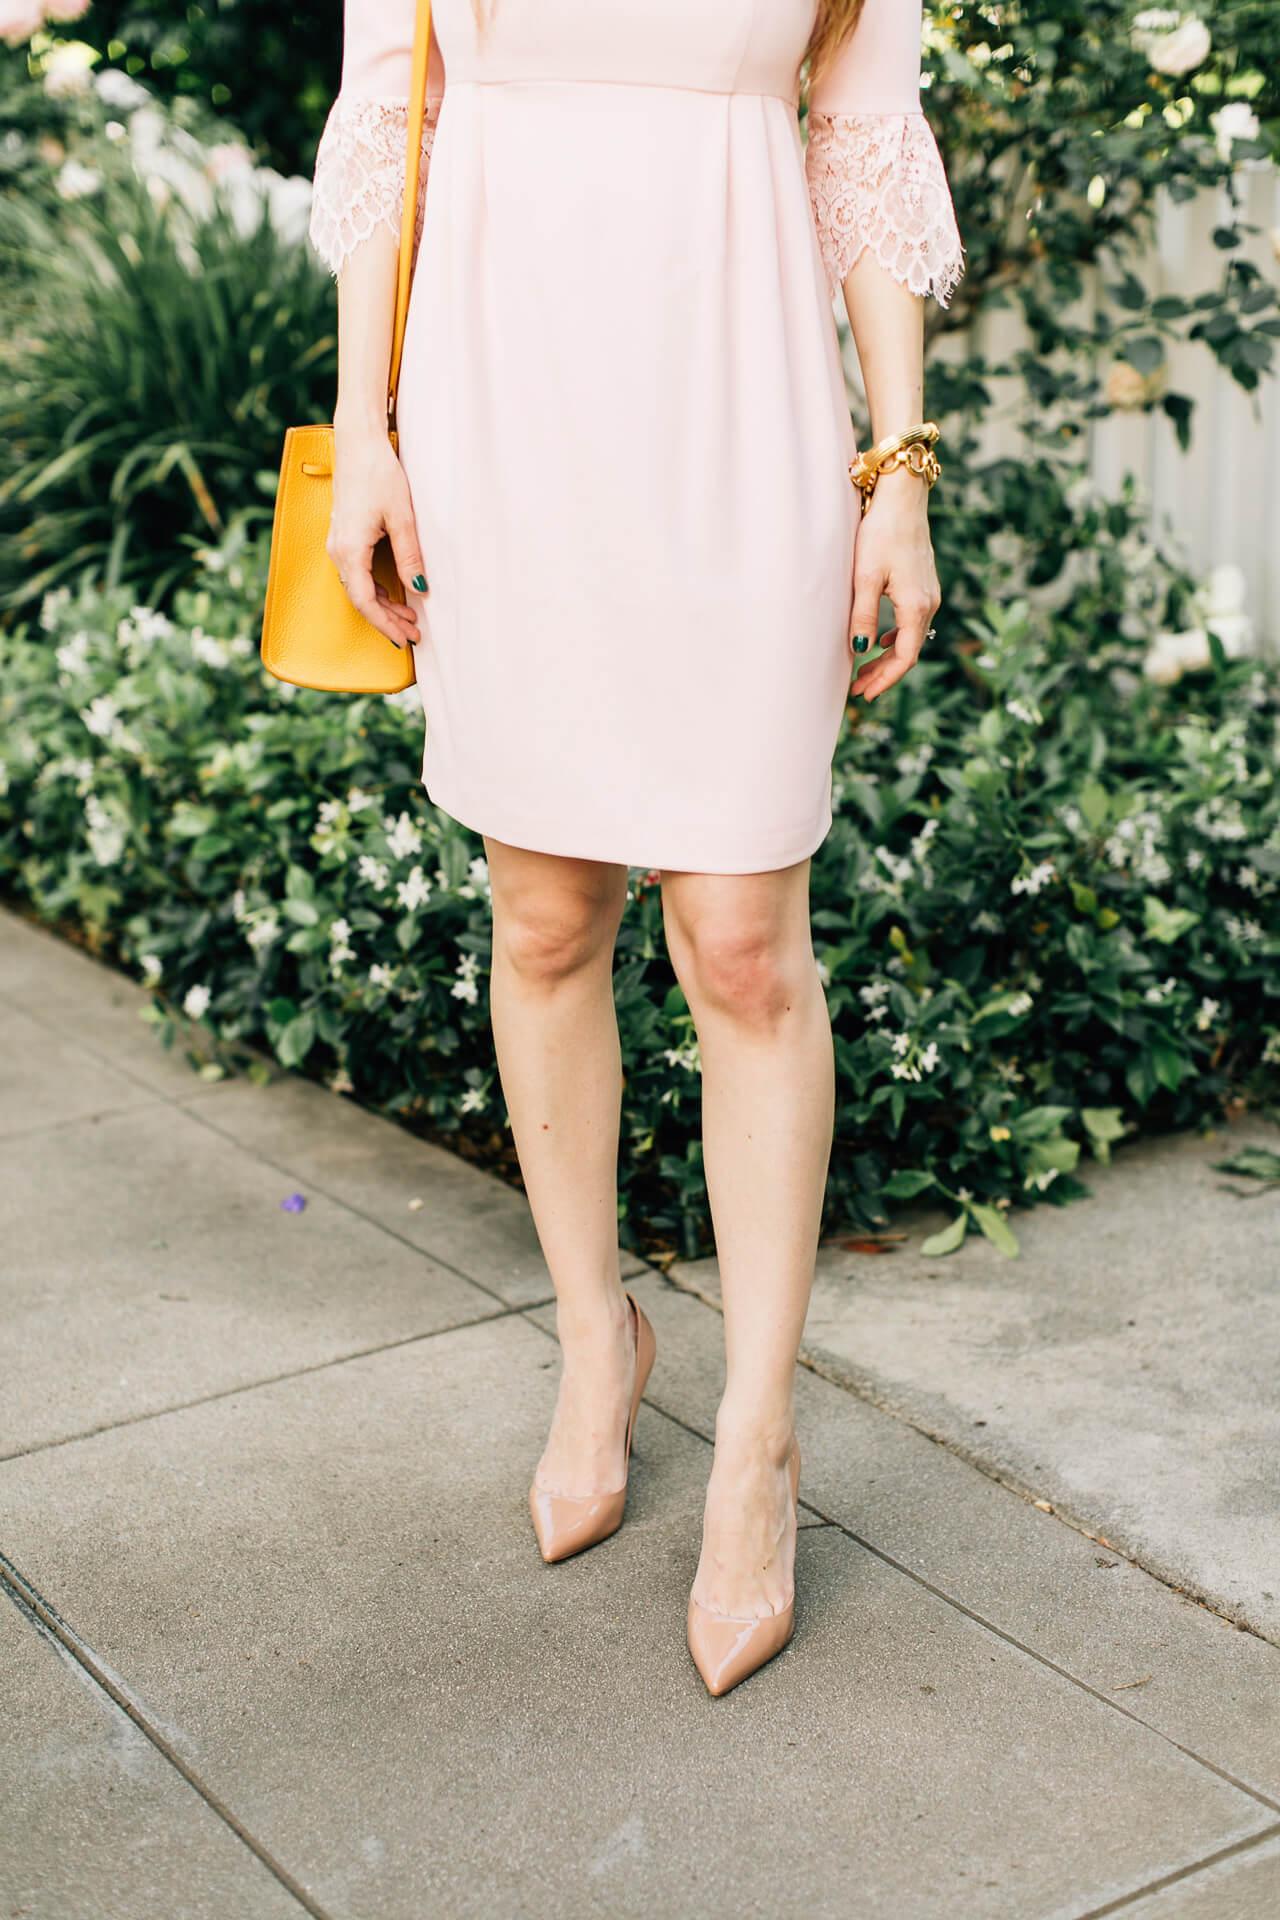 nude heels are always a good choice!